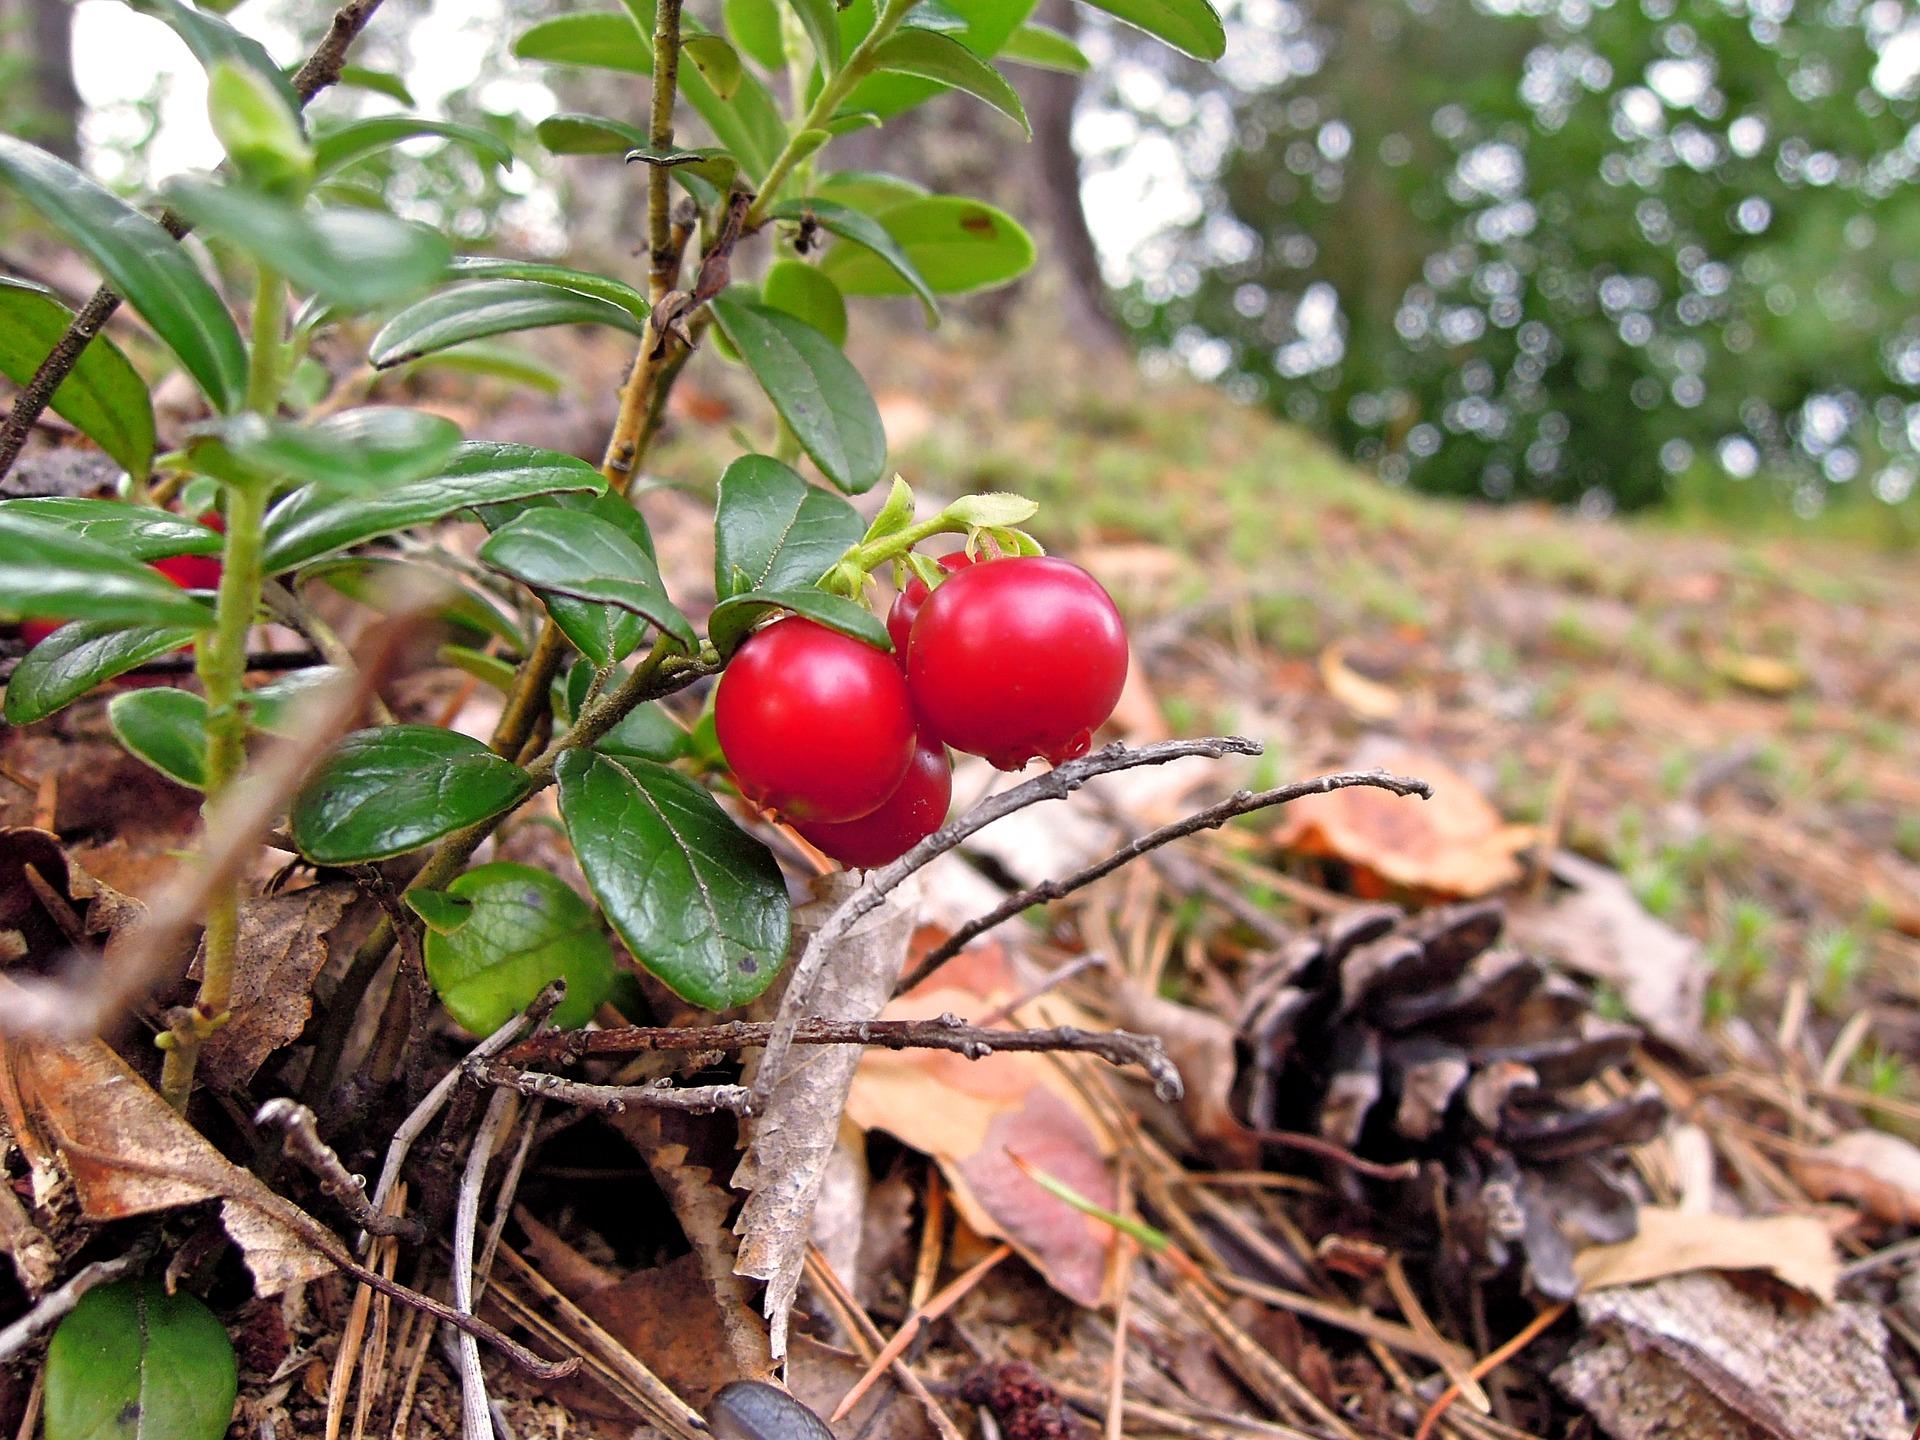 Wild Manitoba berry shows promising health benefits   Fondation de ...